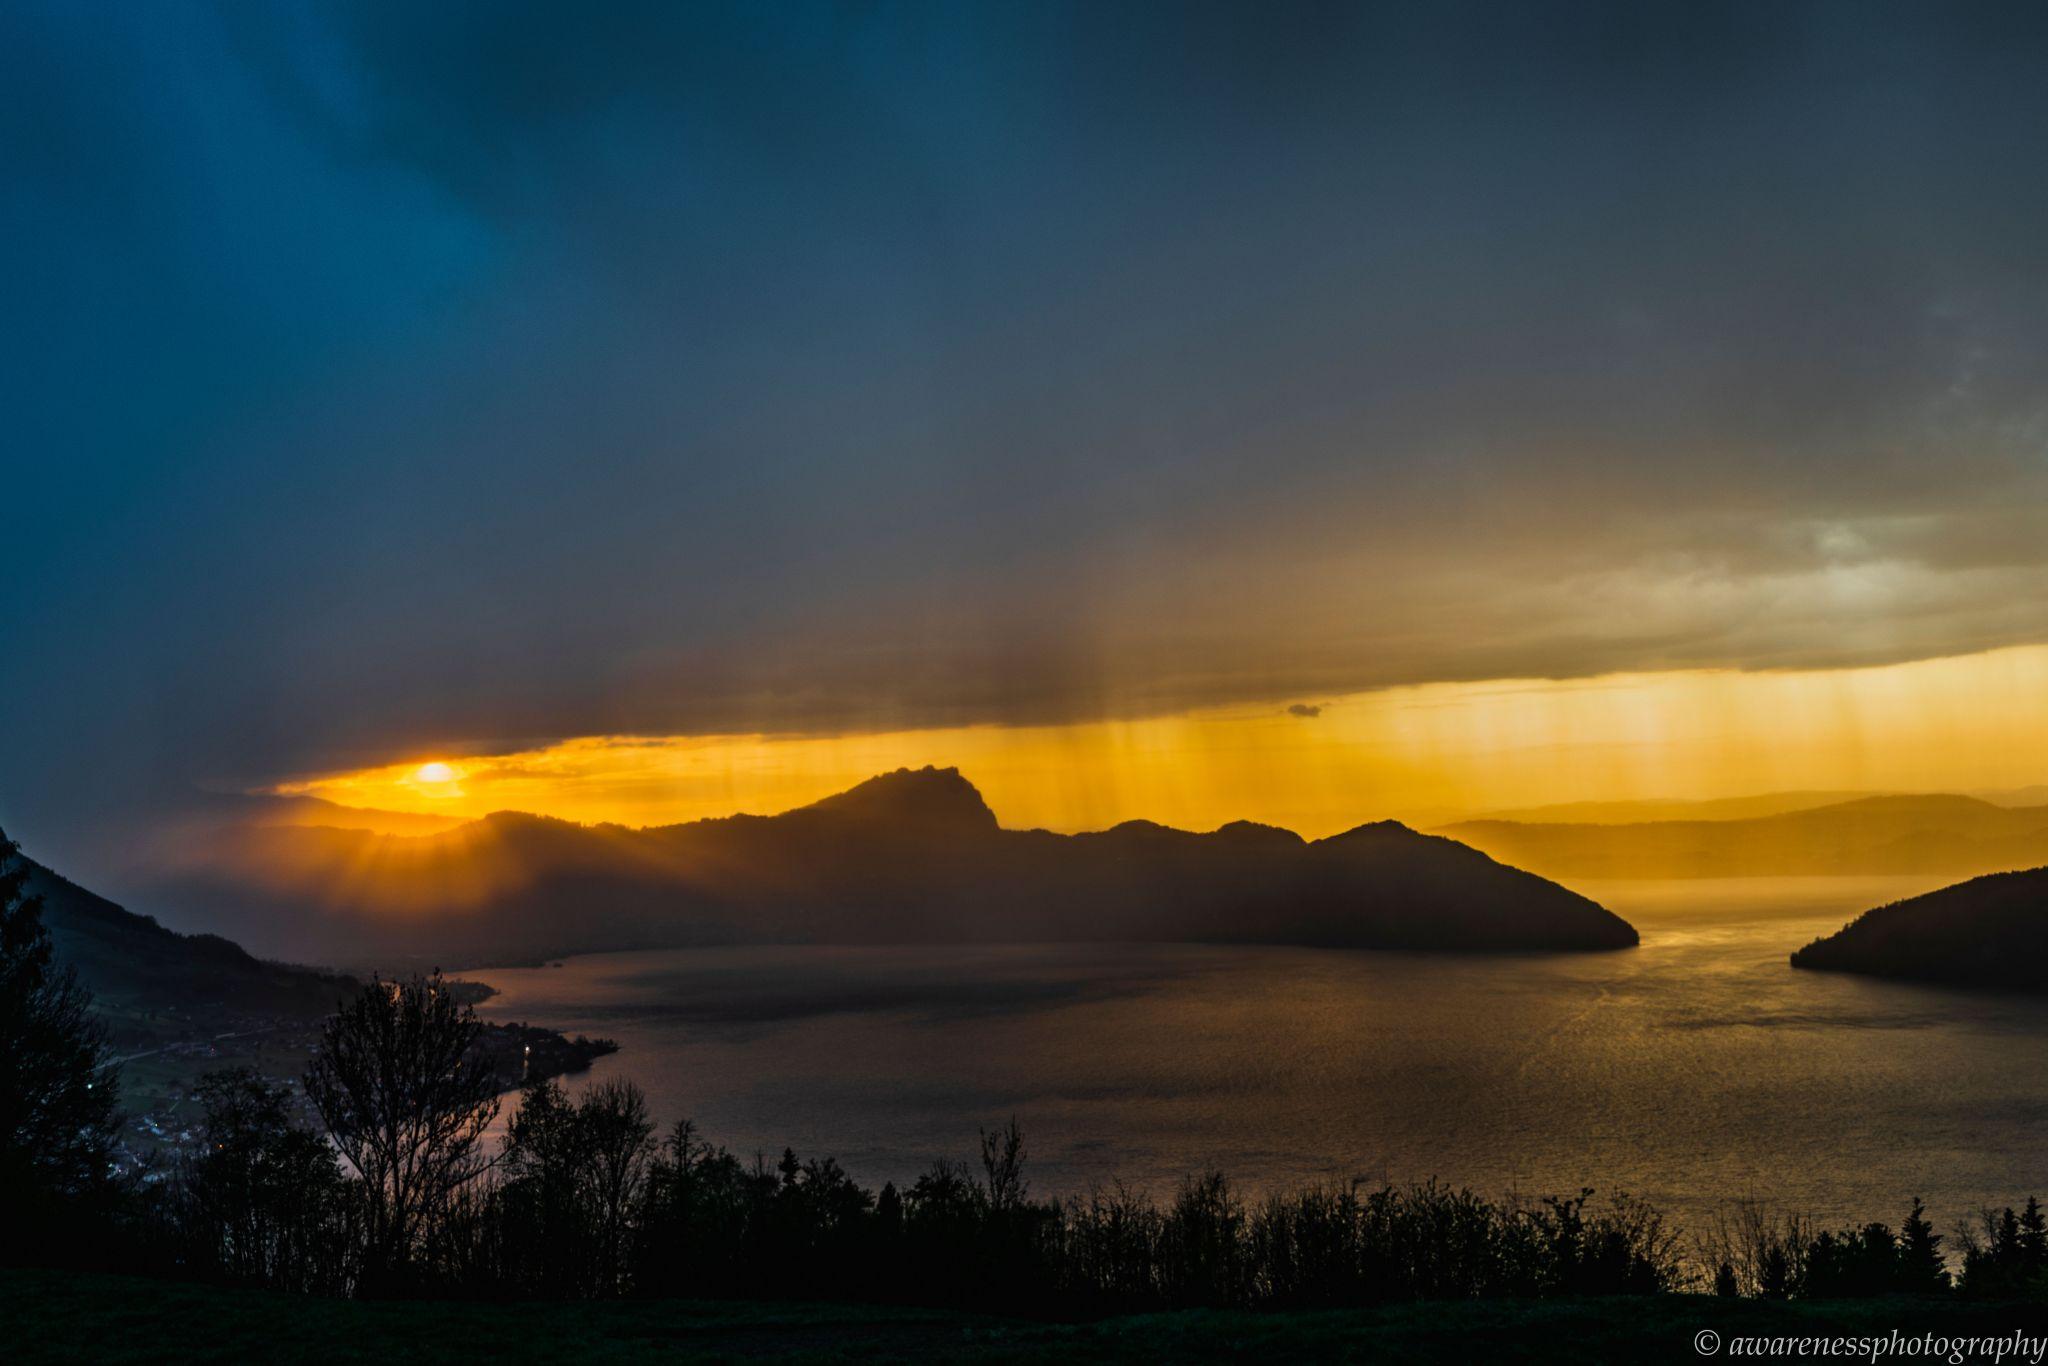 Storm over Lake Lucerne, Switzerland